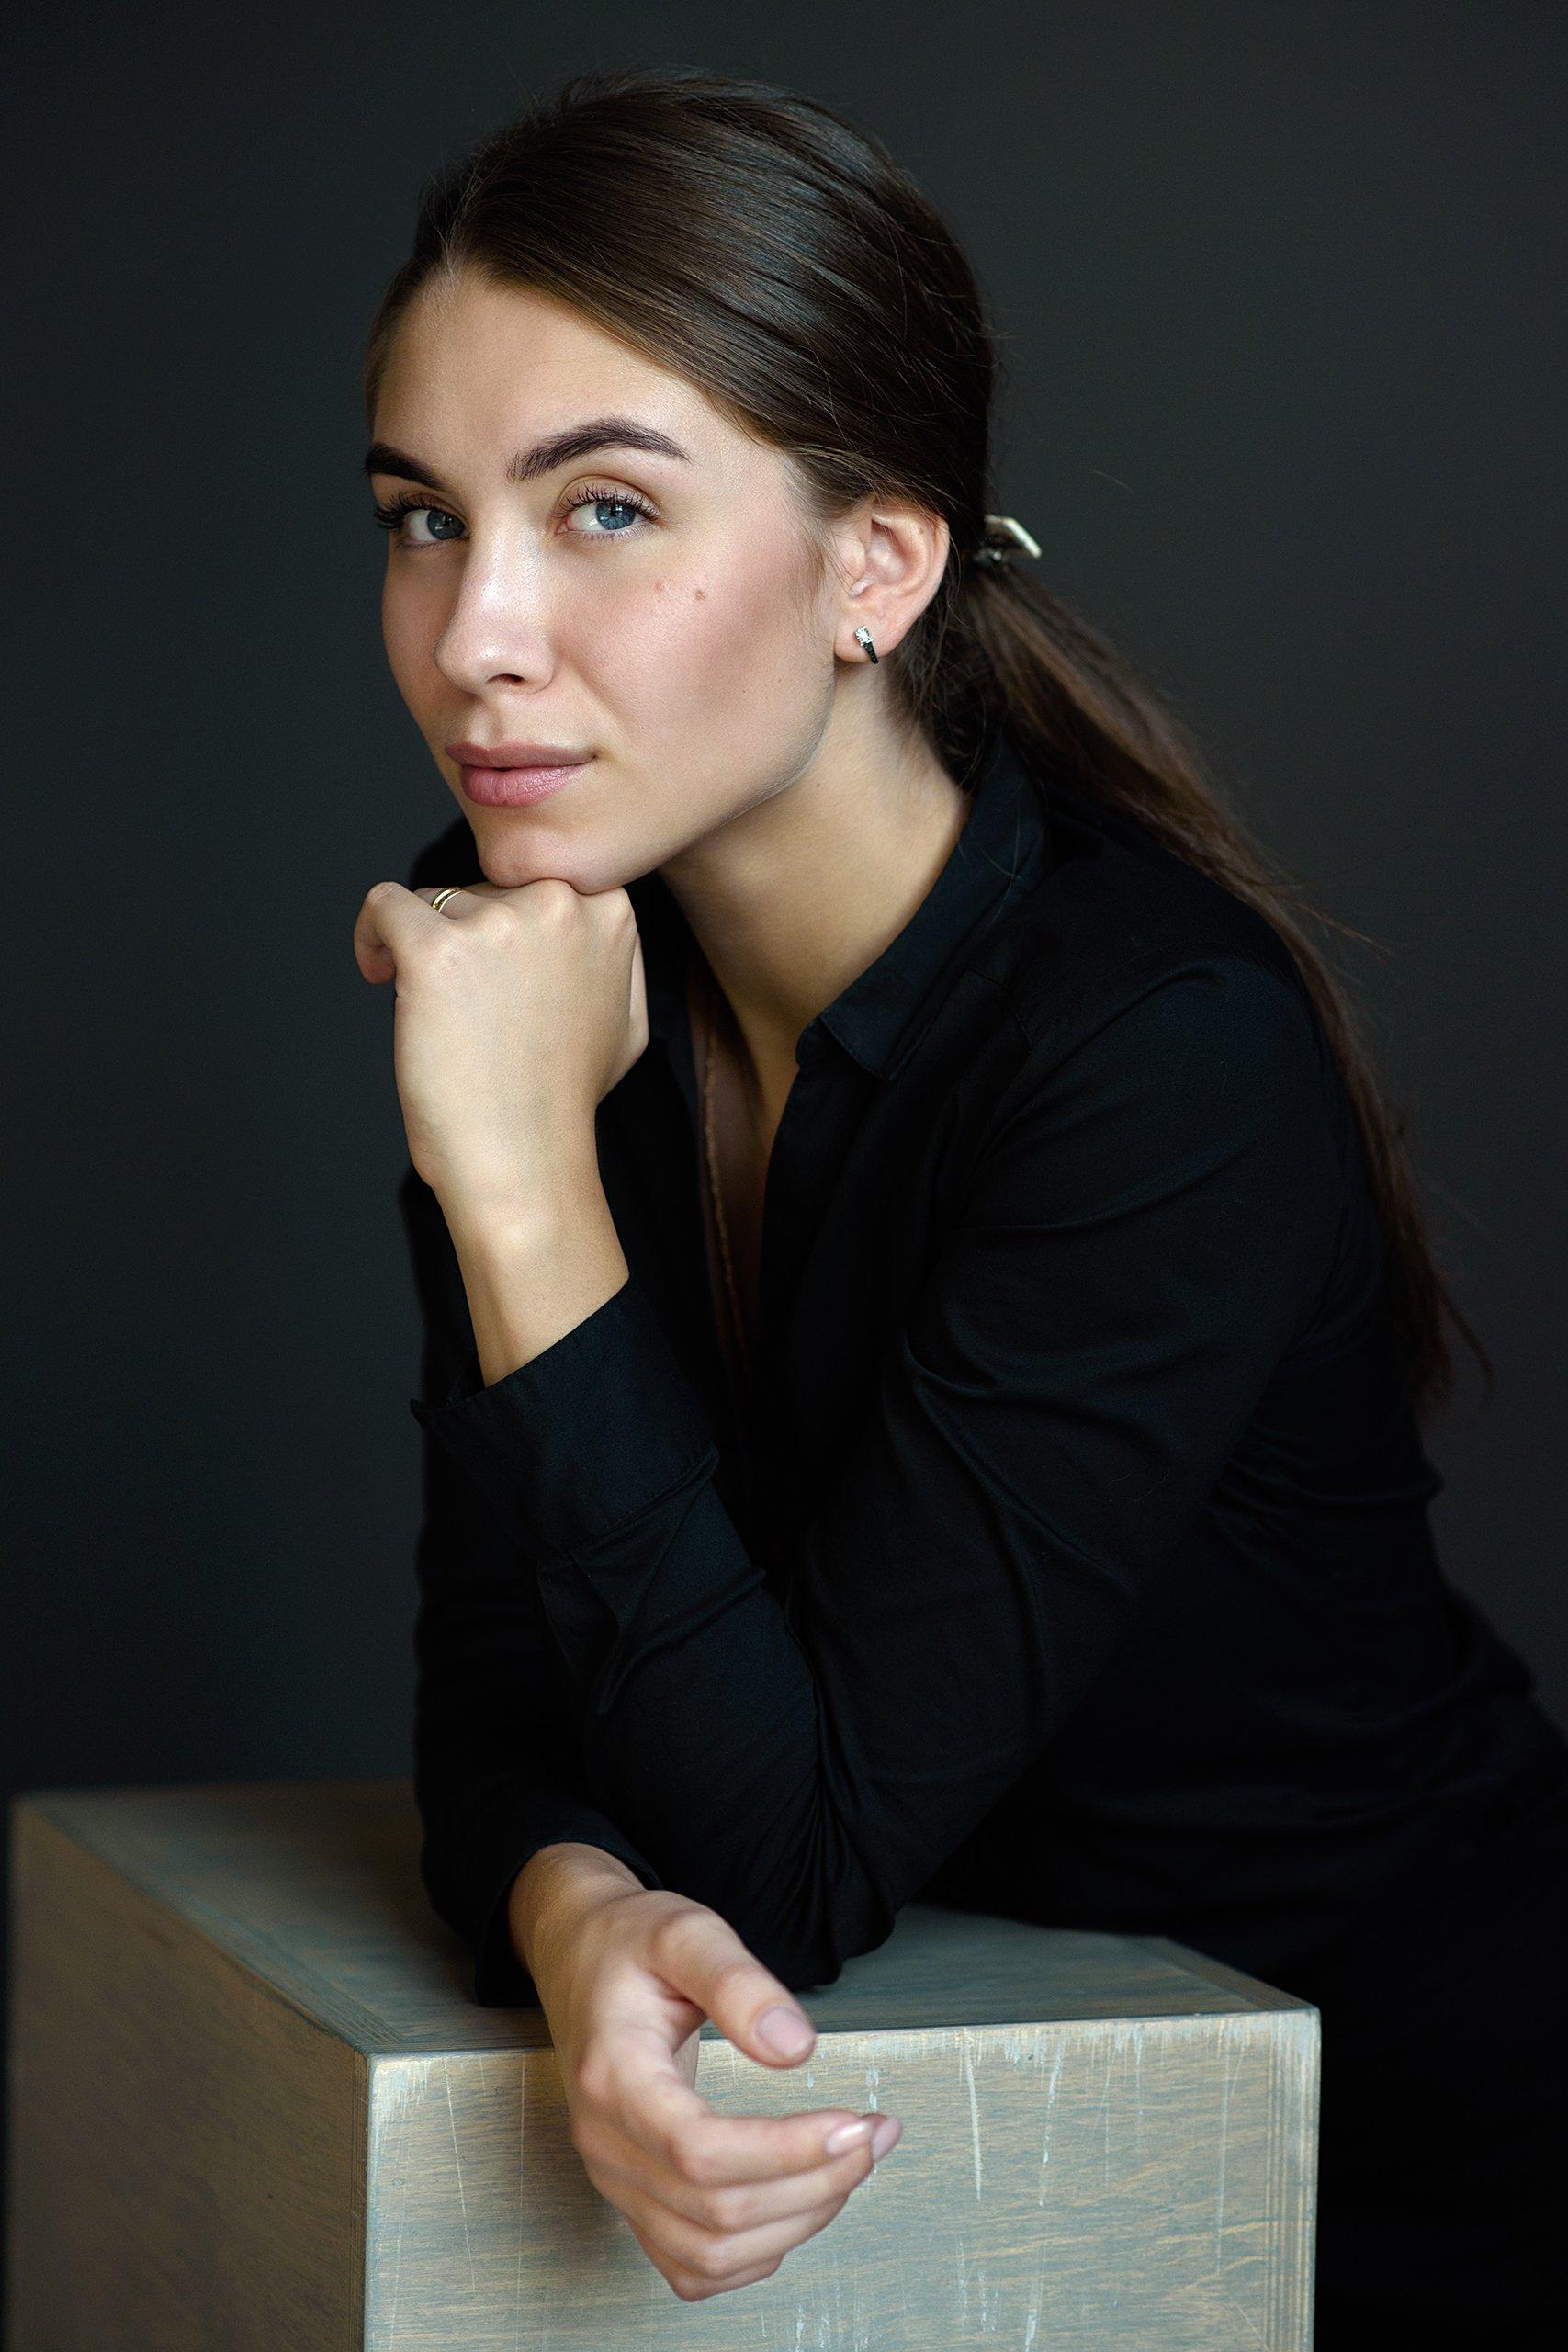 portrait, портрет, Nikon, 85mm, Никон, Александр Макушин